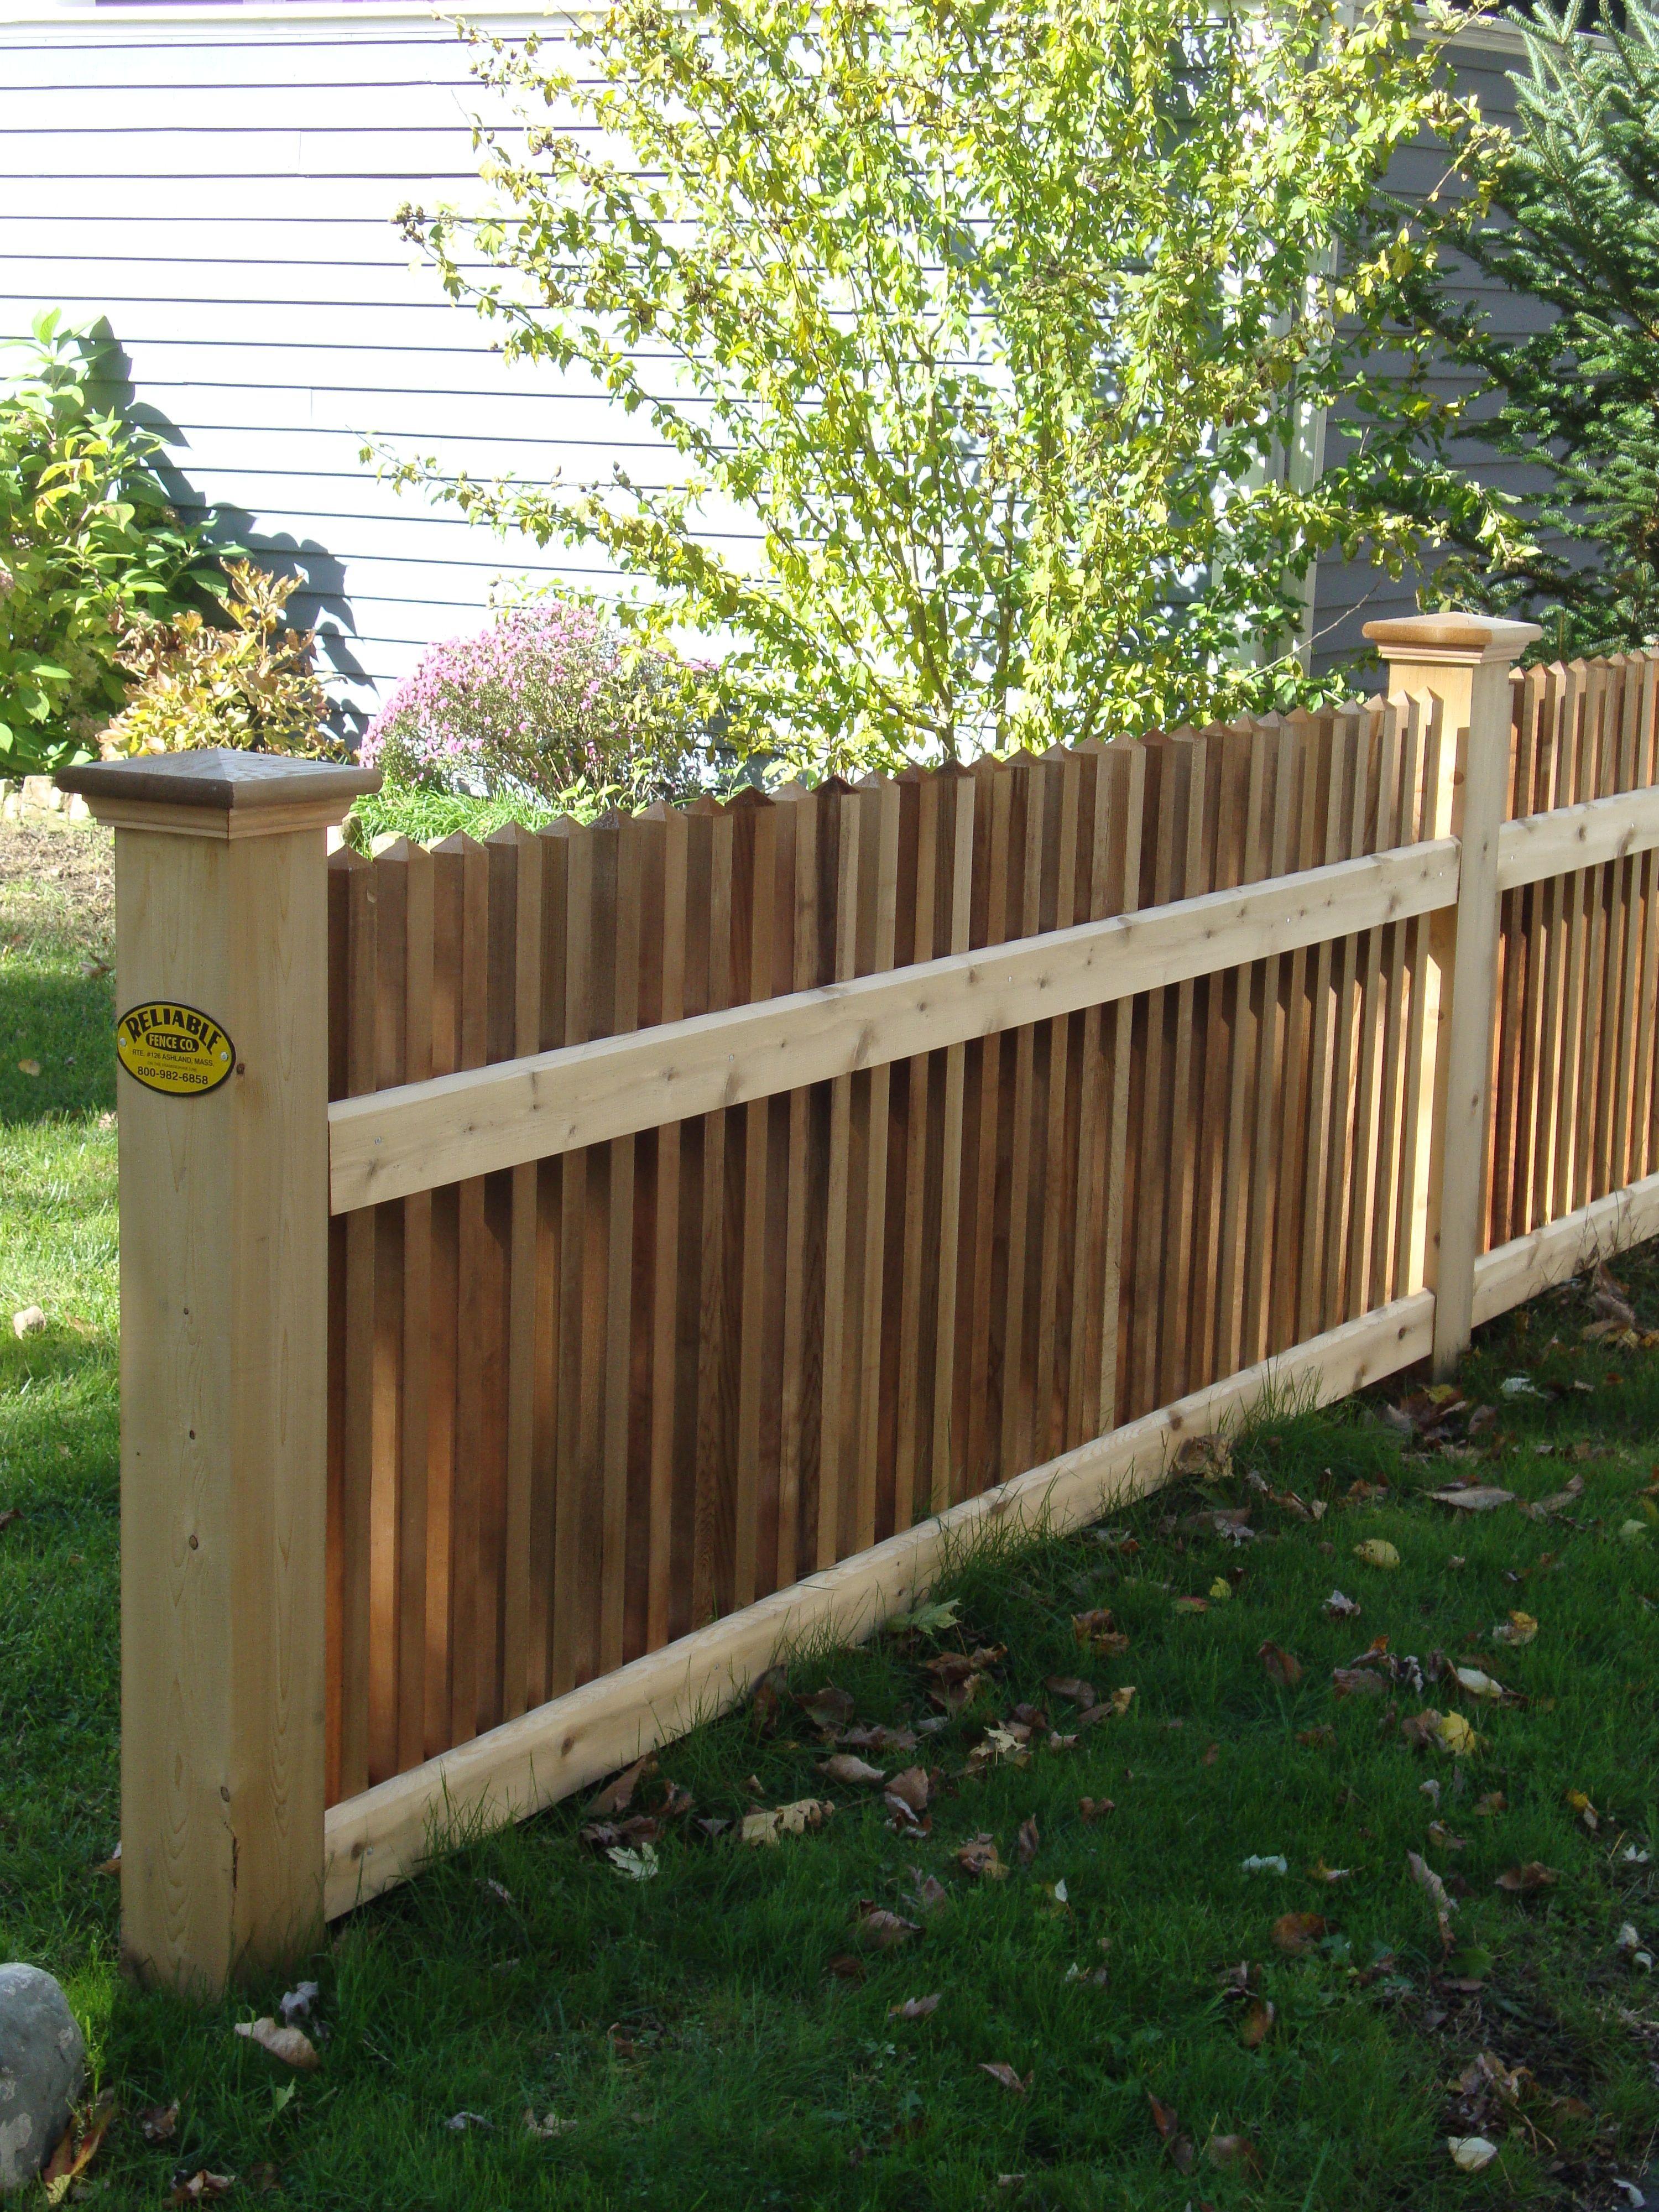 Cedar Spoke Style Fence Backyard Fences Wood Fence Design Fence Landscaping